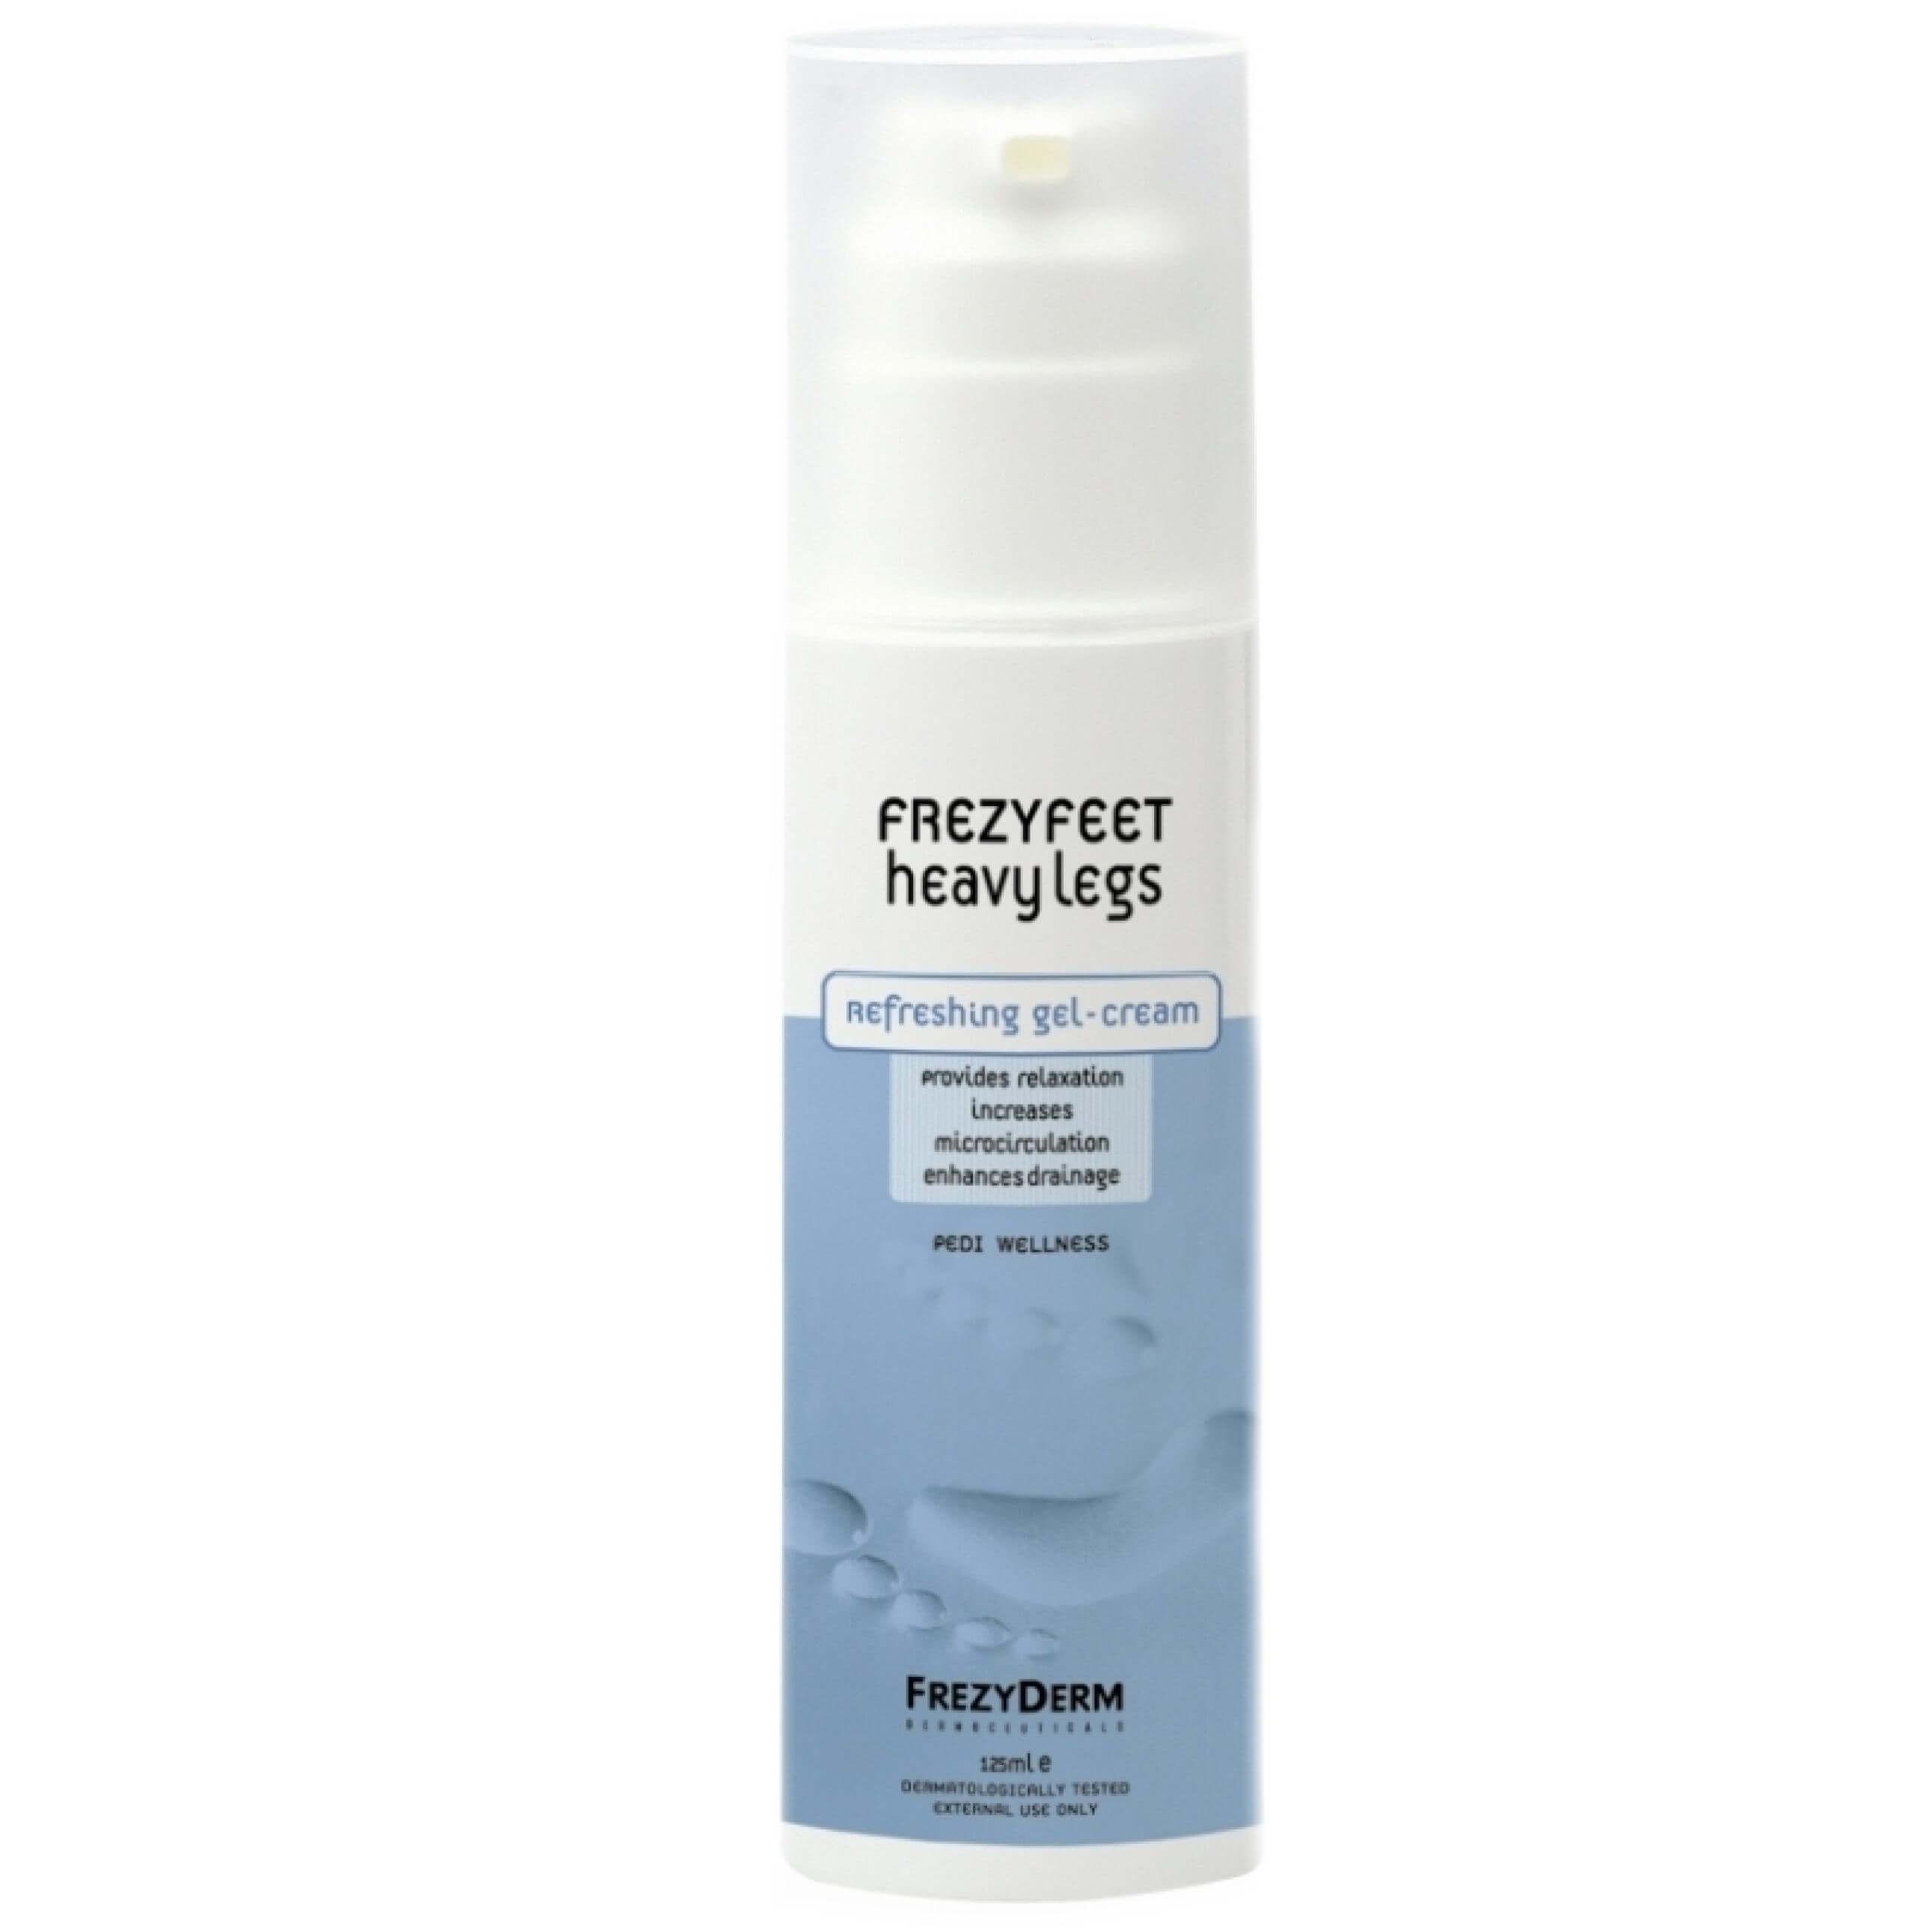 Frezyderm Frezyfeet Heavy Legs Cream – Gel για Βαριά &Κουρασμένα Πόδια 125ml